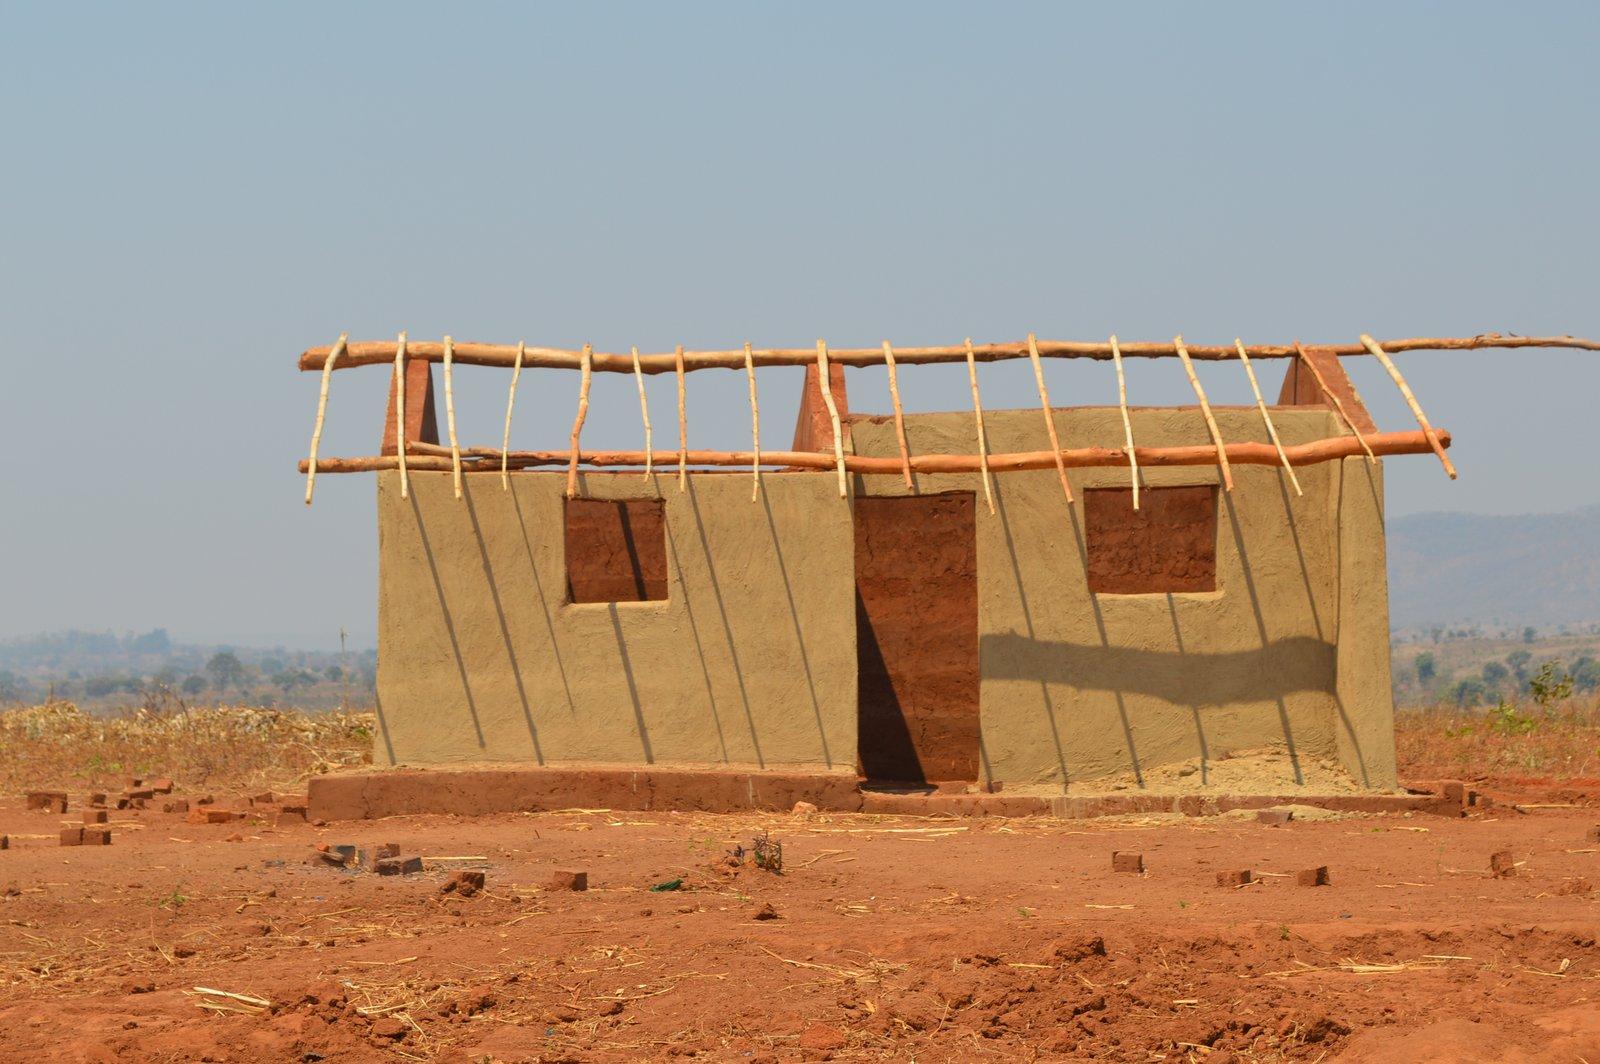 Malawi Vernacular Architecture (6)